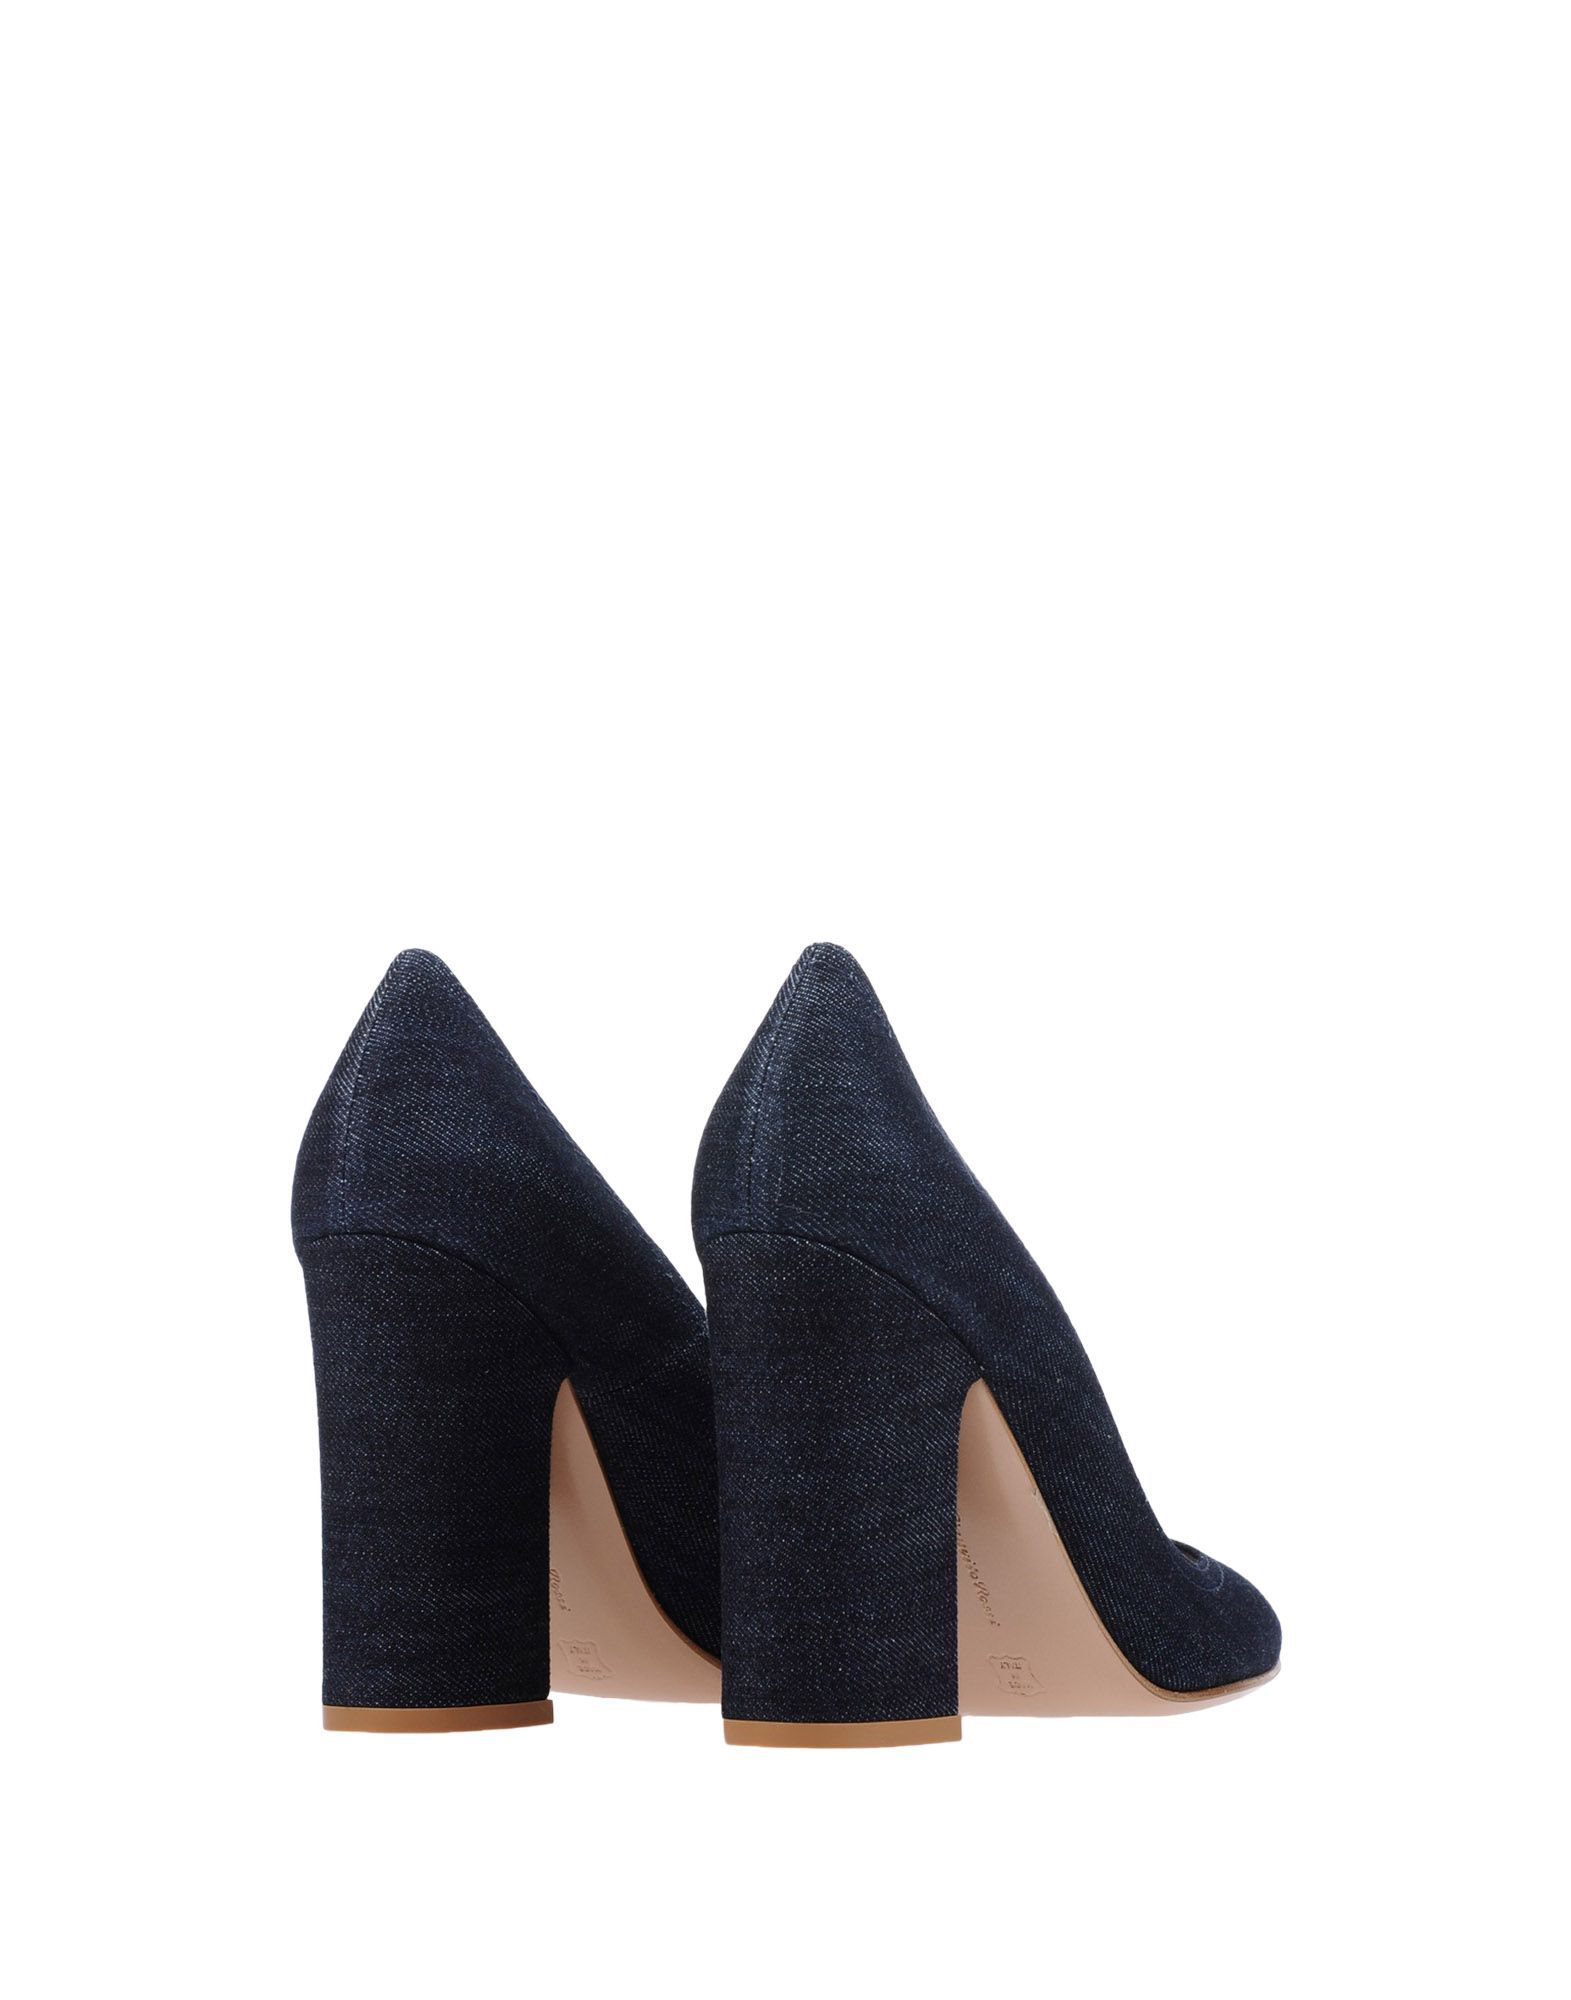 Rabatt Schuhe  Gianvito Rossi Pumps Damen  Schuhe 11356566DX 3b8265